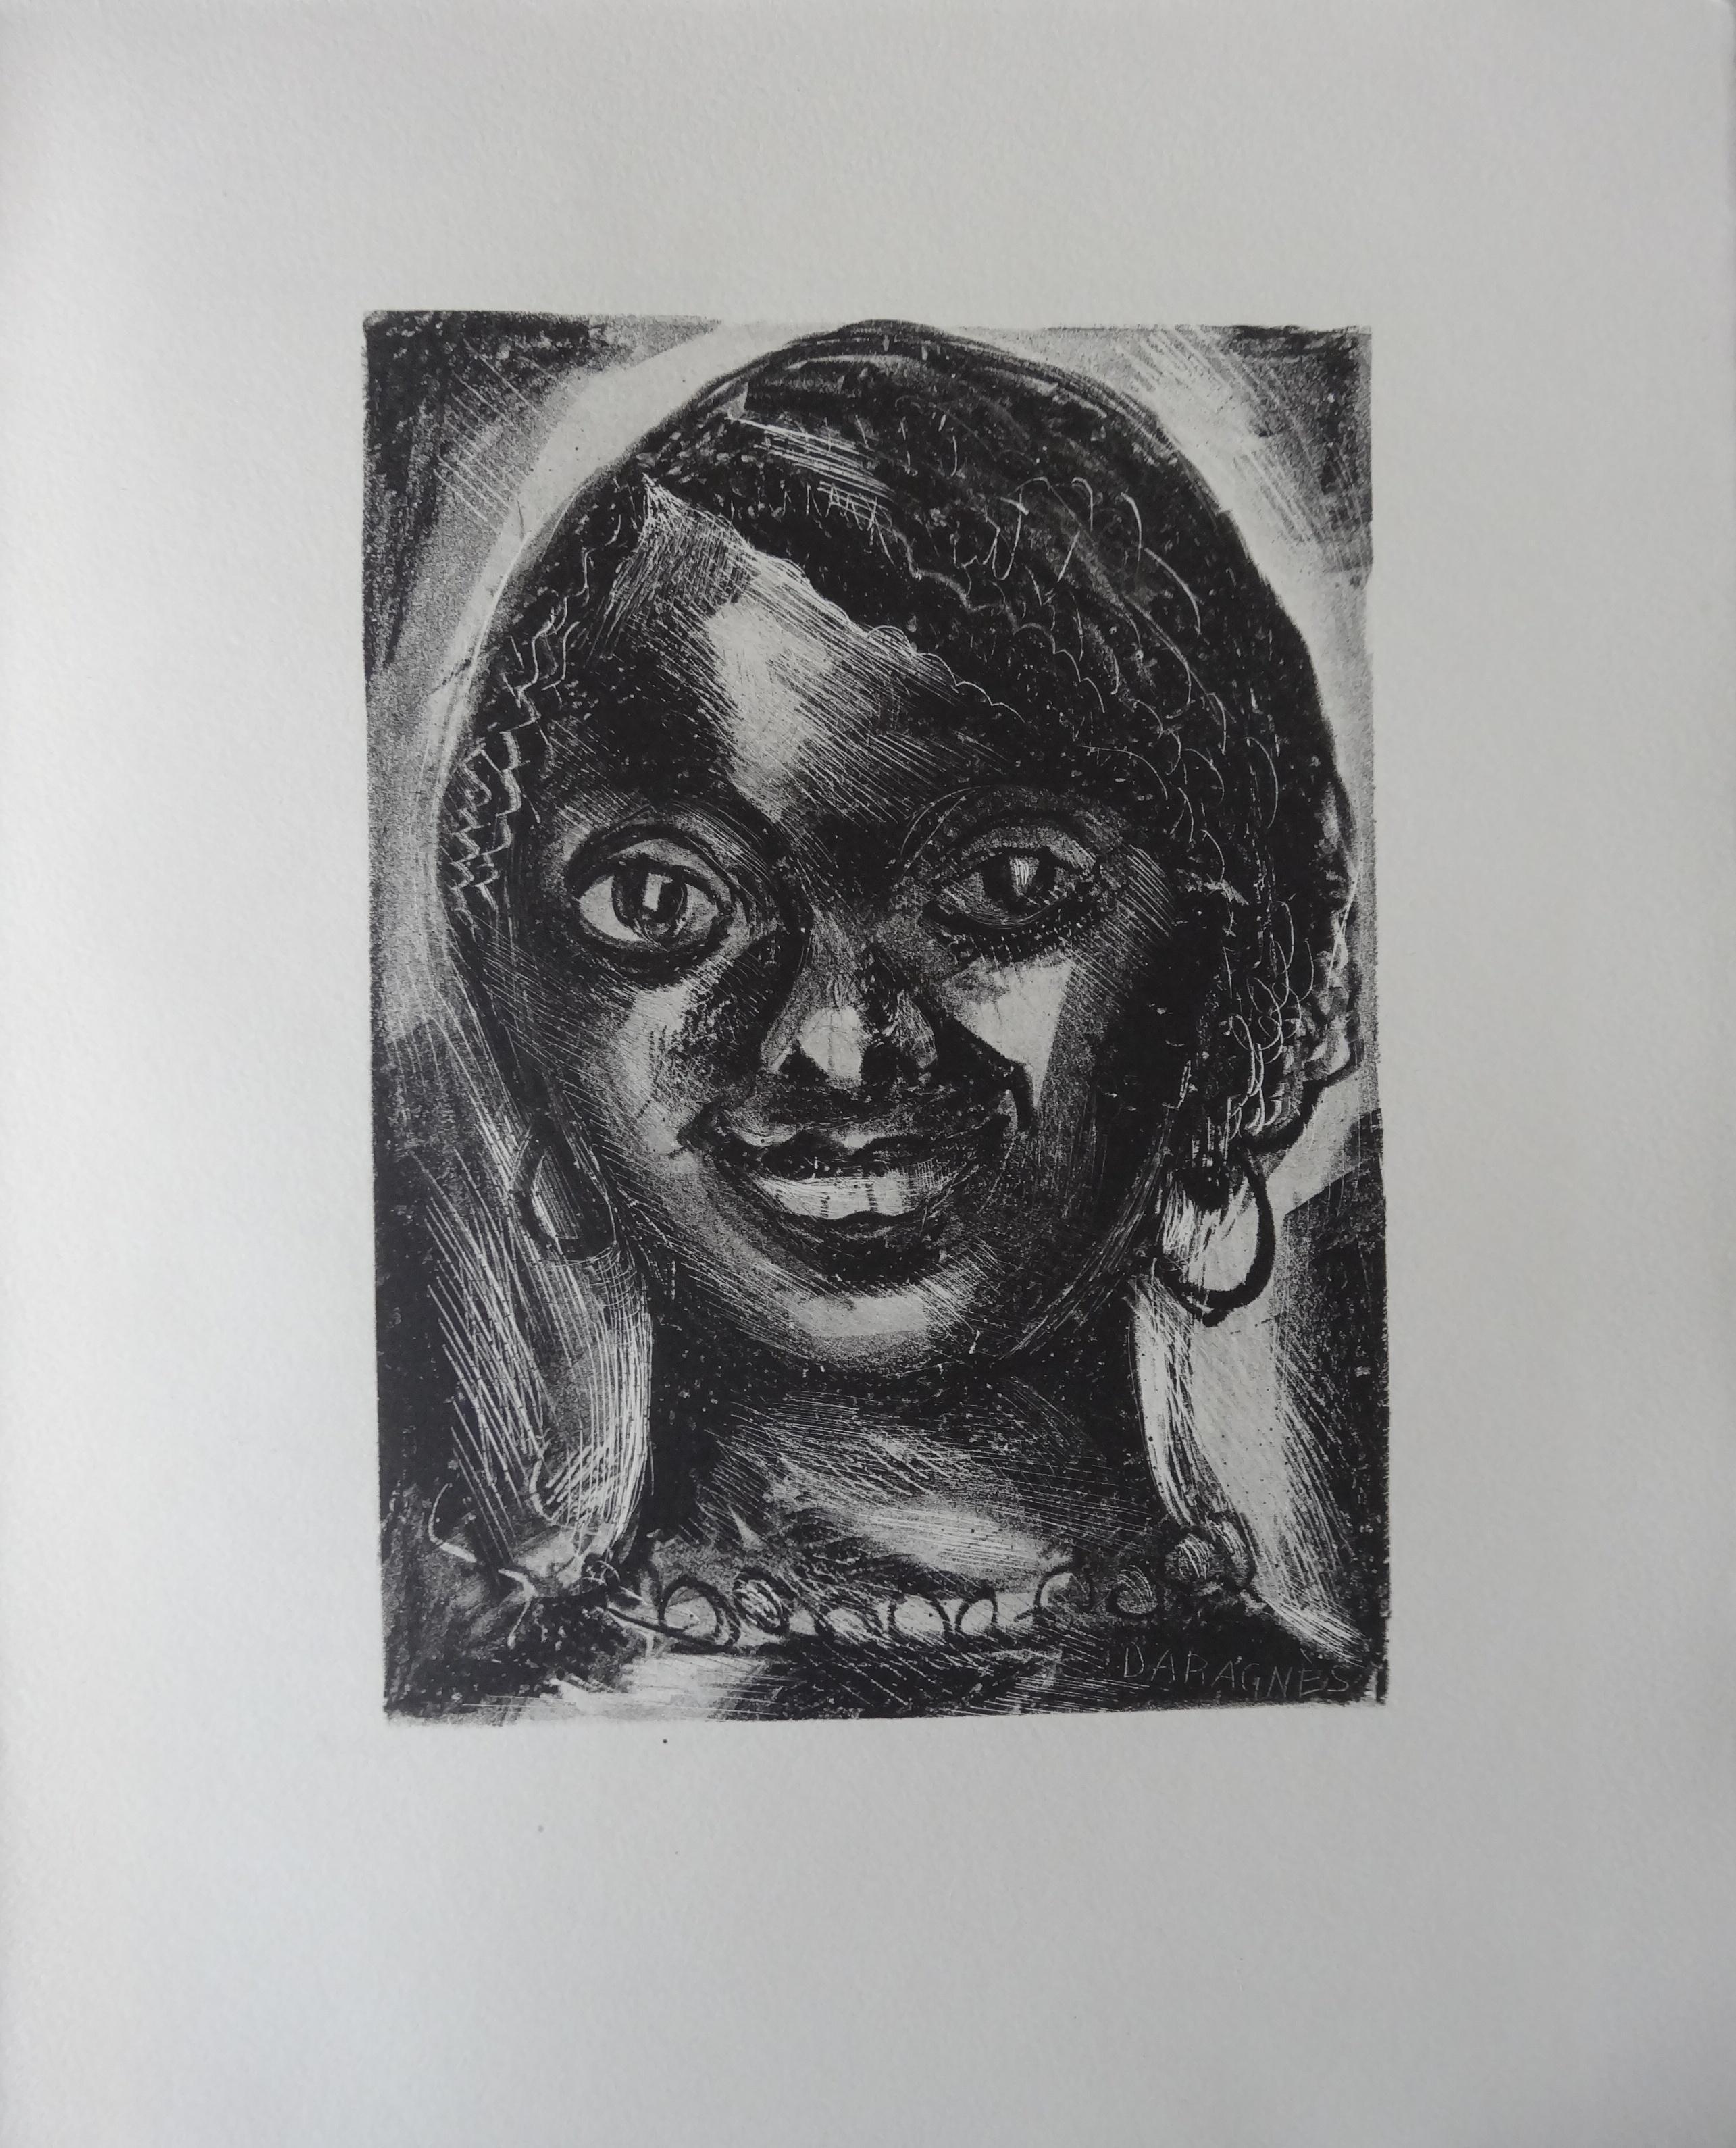 Smilling Woman - Stone lithograph, 1930